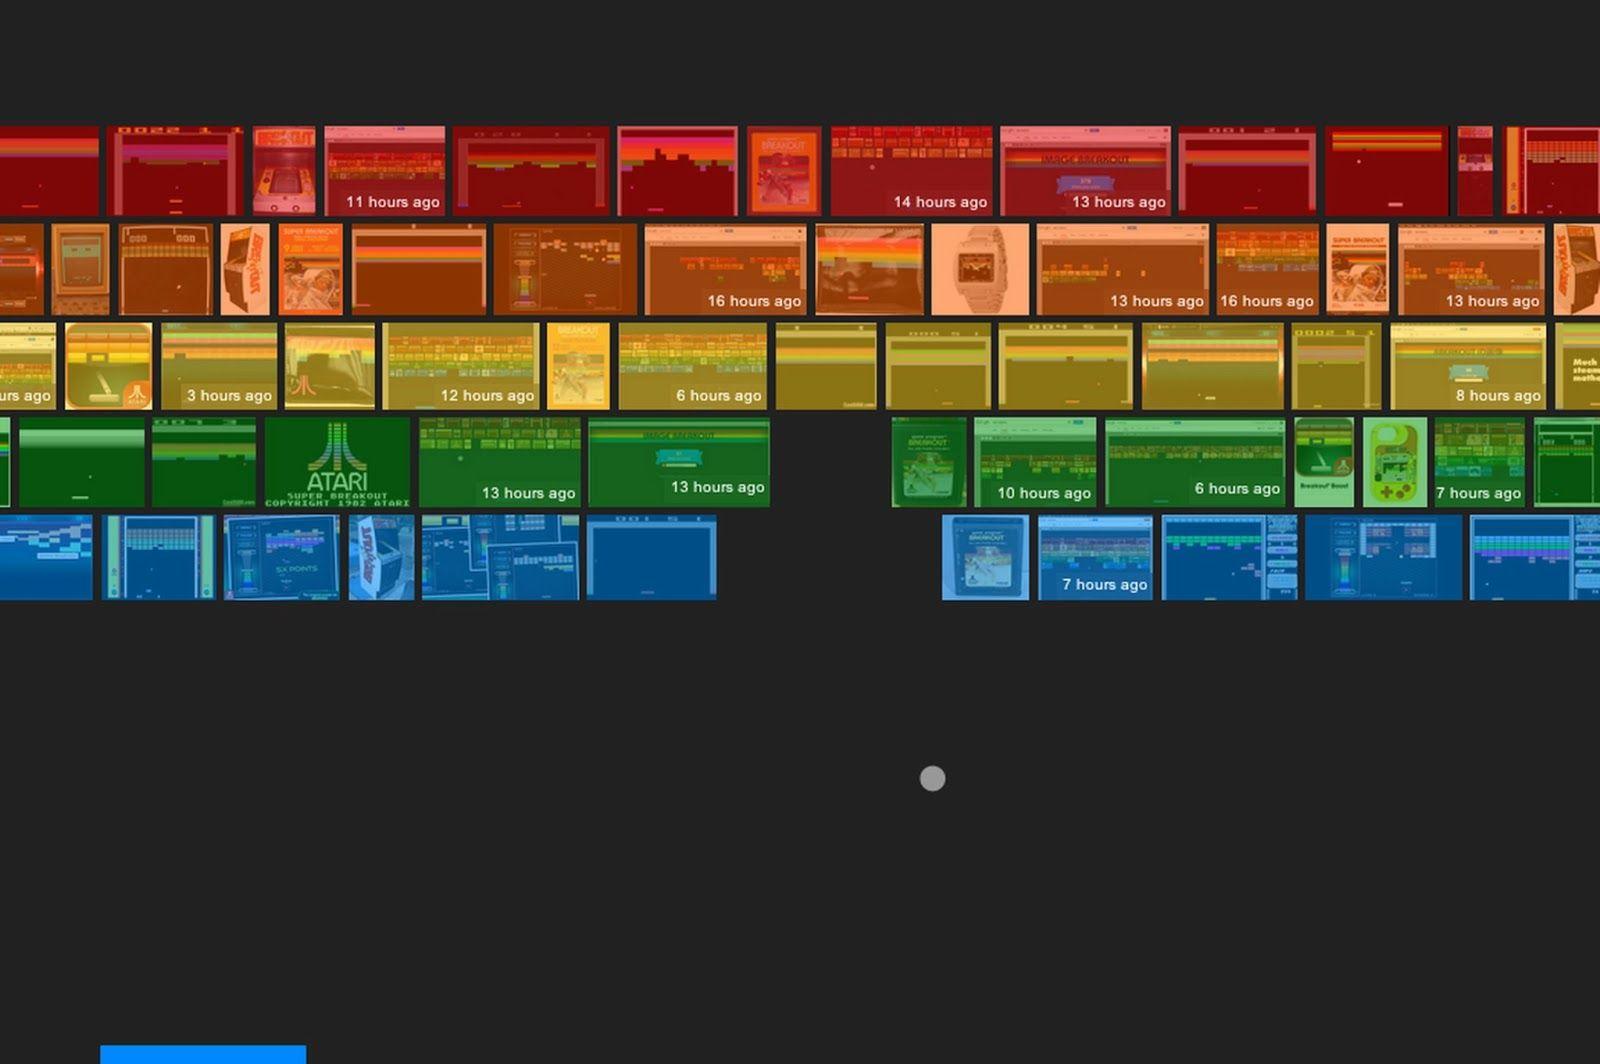 Google celebrates Atari Breakout (Dengan gambar)